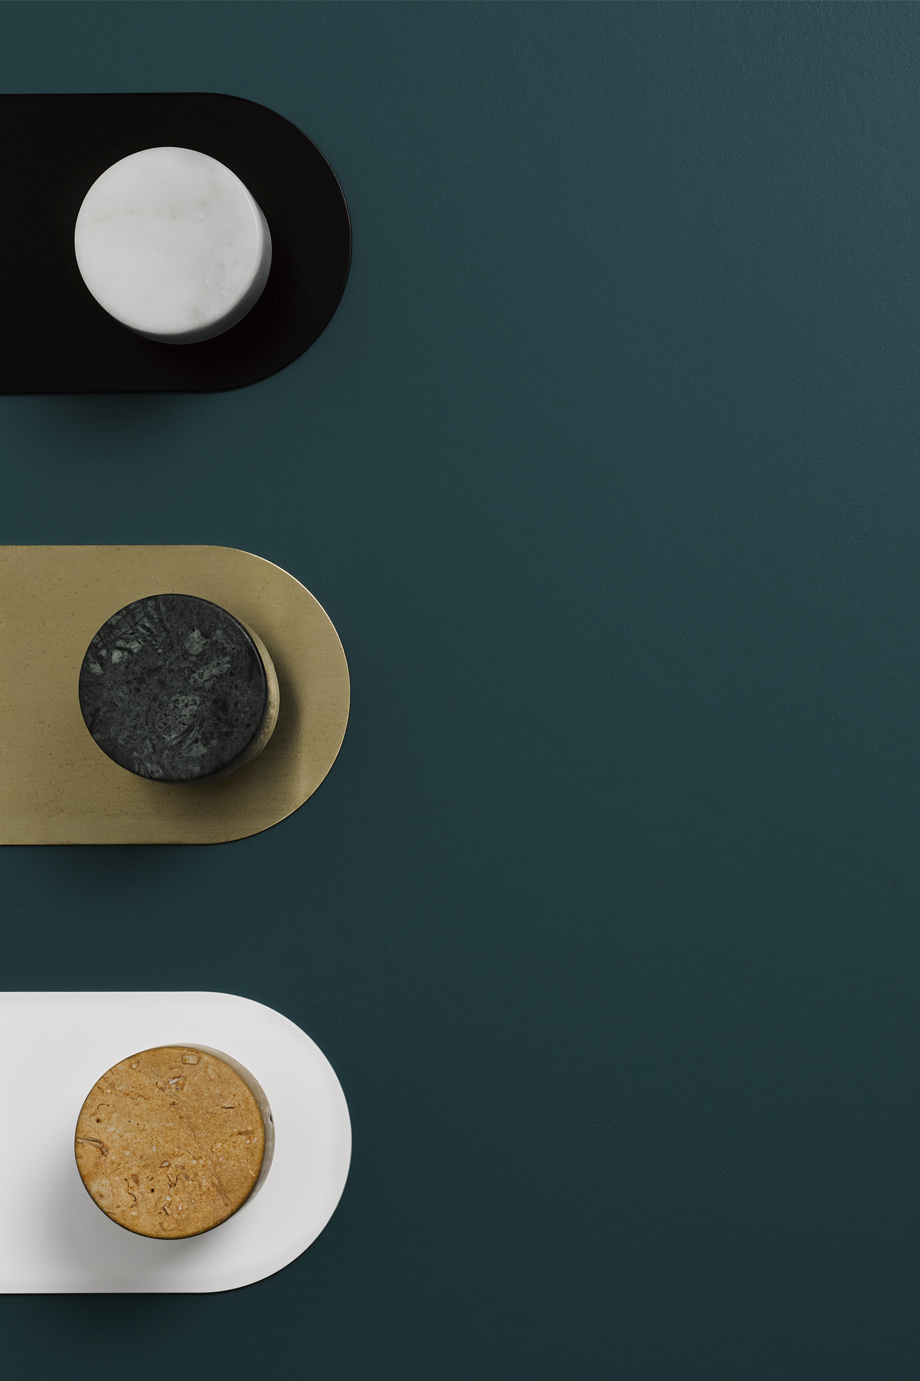 Bit Part-Brooke Holm-Megan Morton-Marble-Door Knobs-BackPlates-Green.jpg